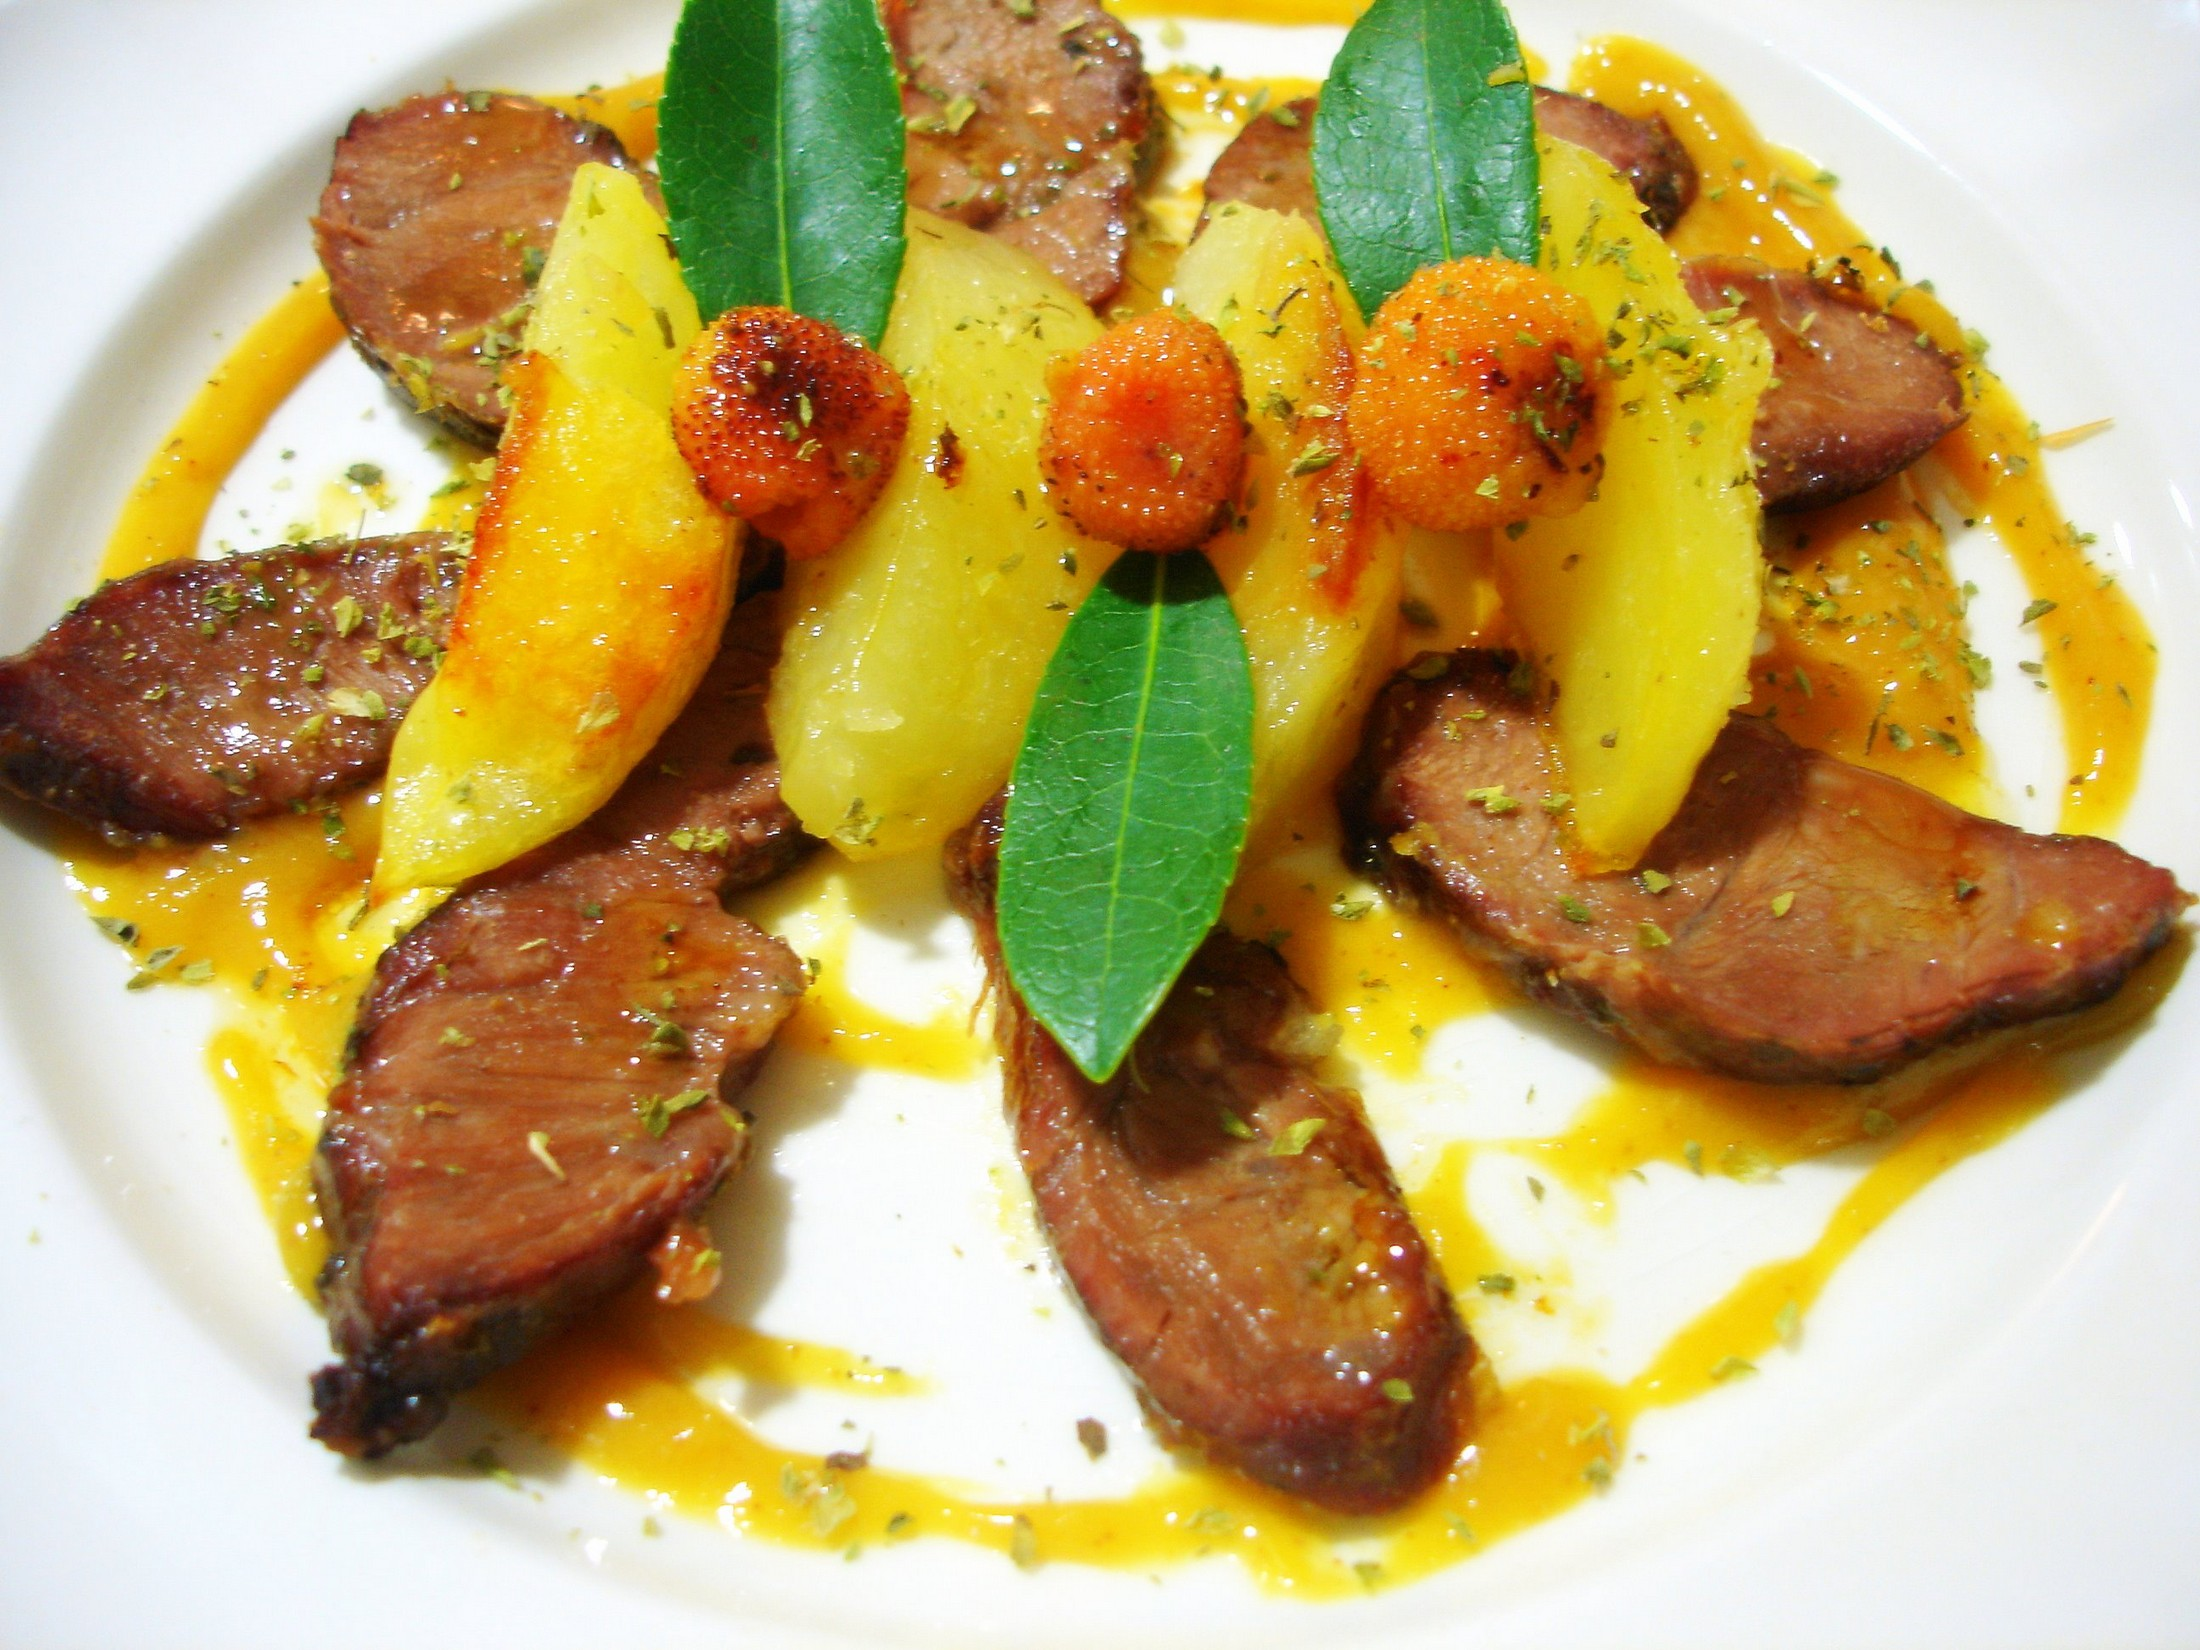 Carrilladas de cerdo ibérico asadas con salsa de madroños